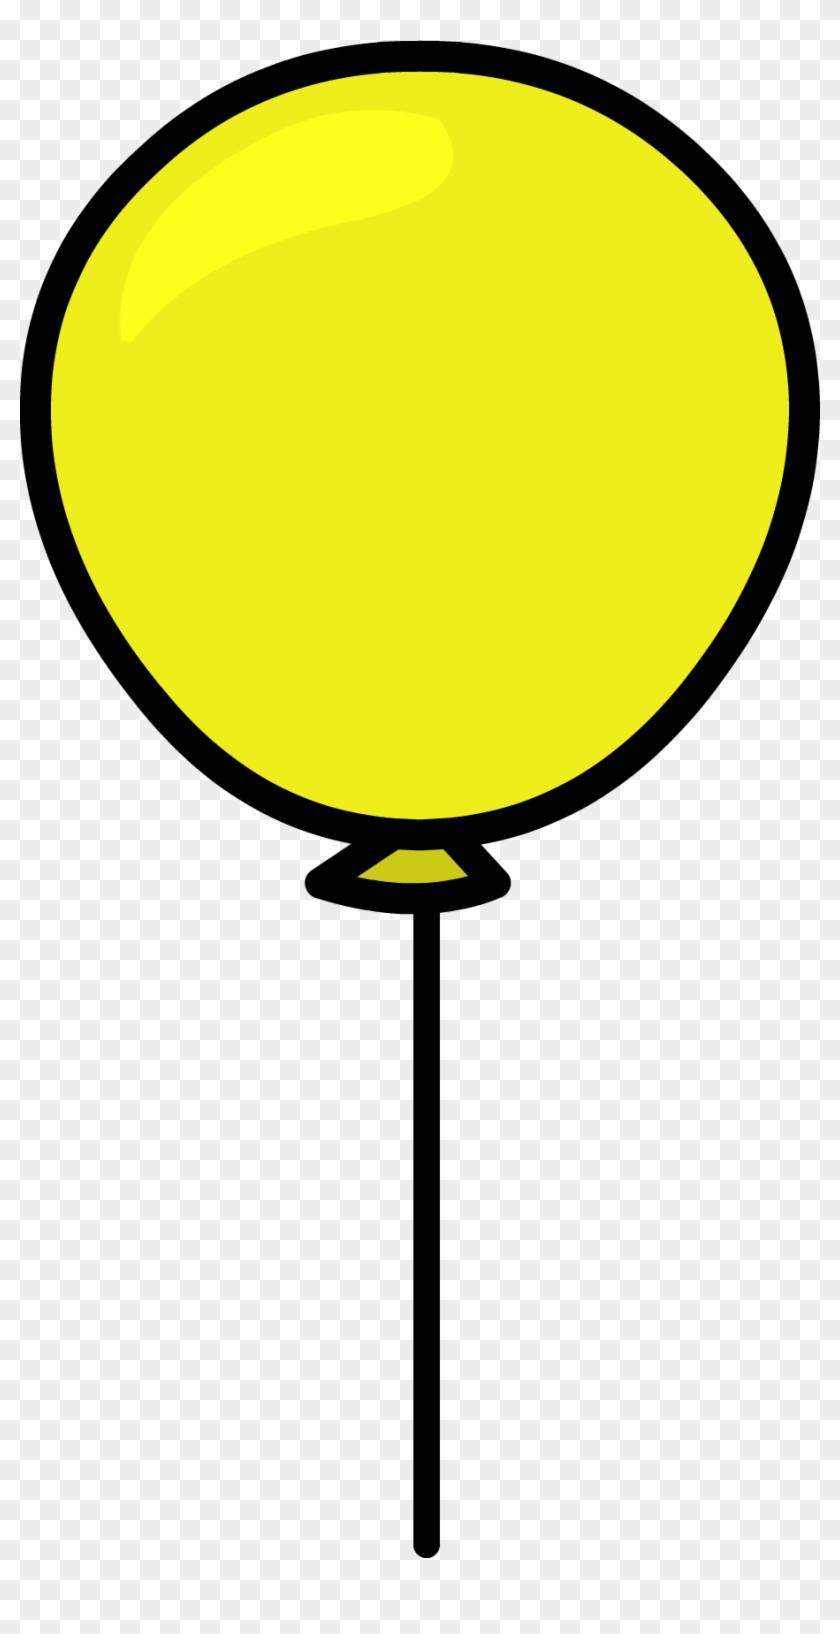 Yellow Balloon Sprite 005 - Yellow Balloon Png #1319989